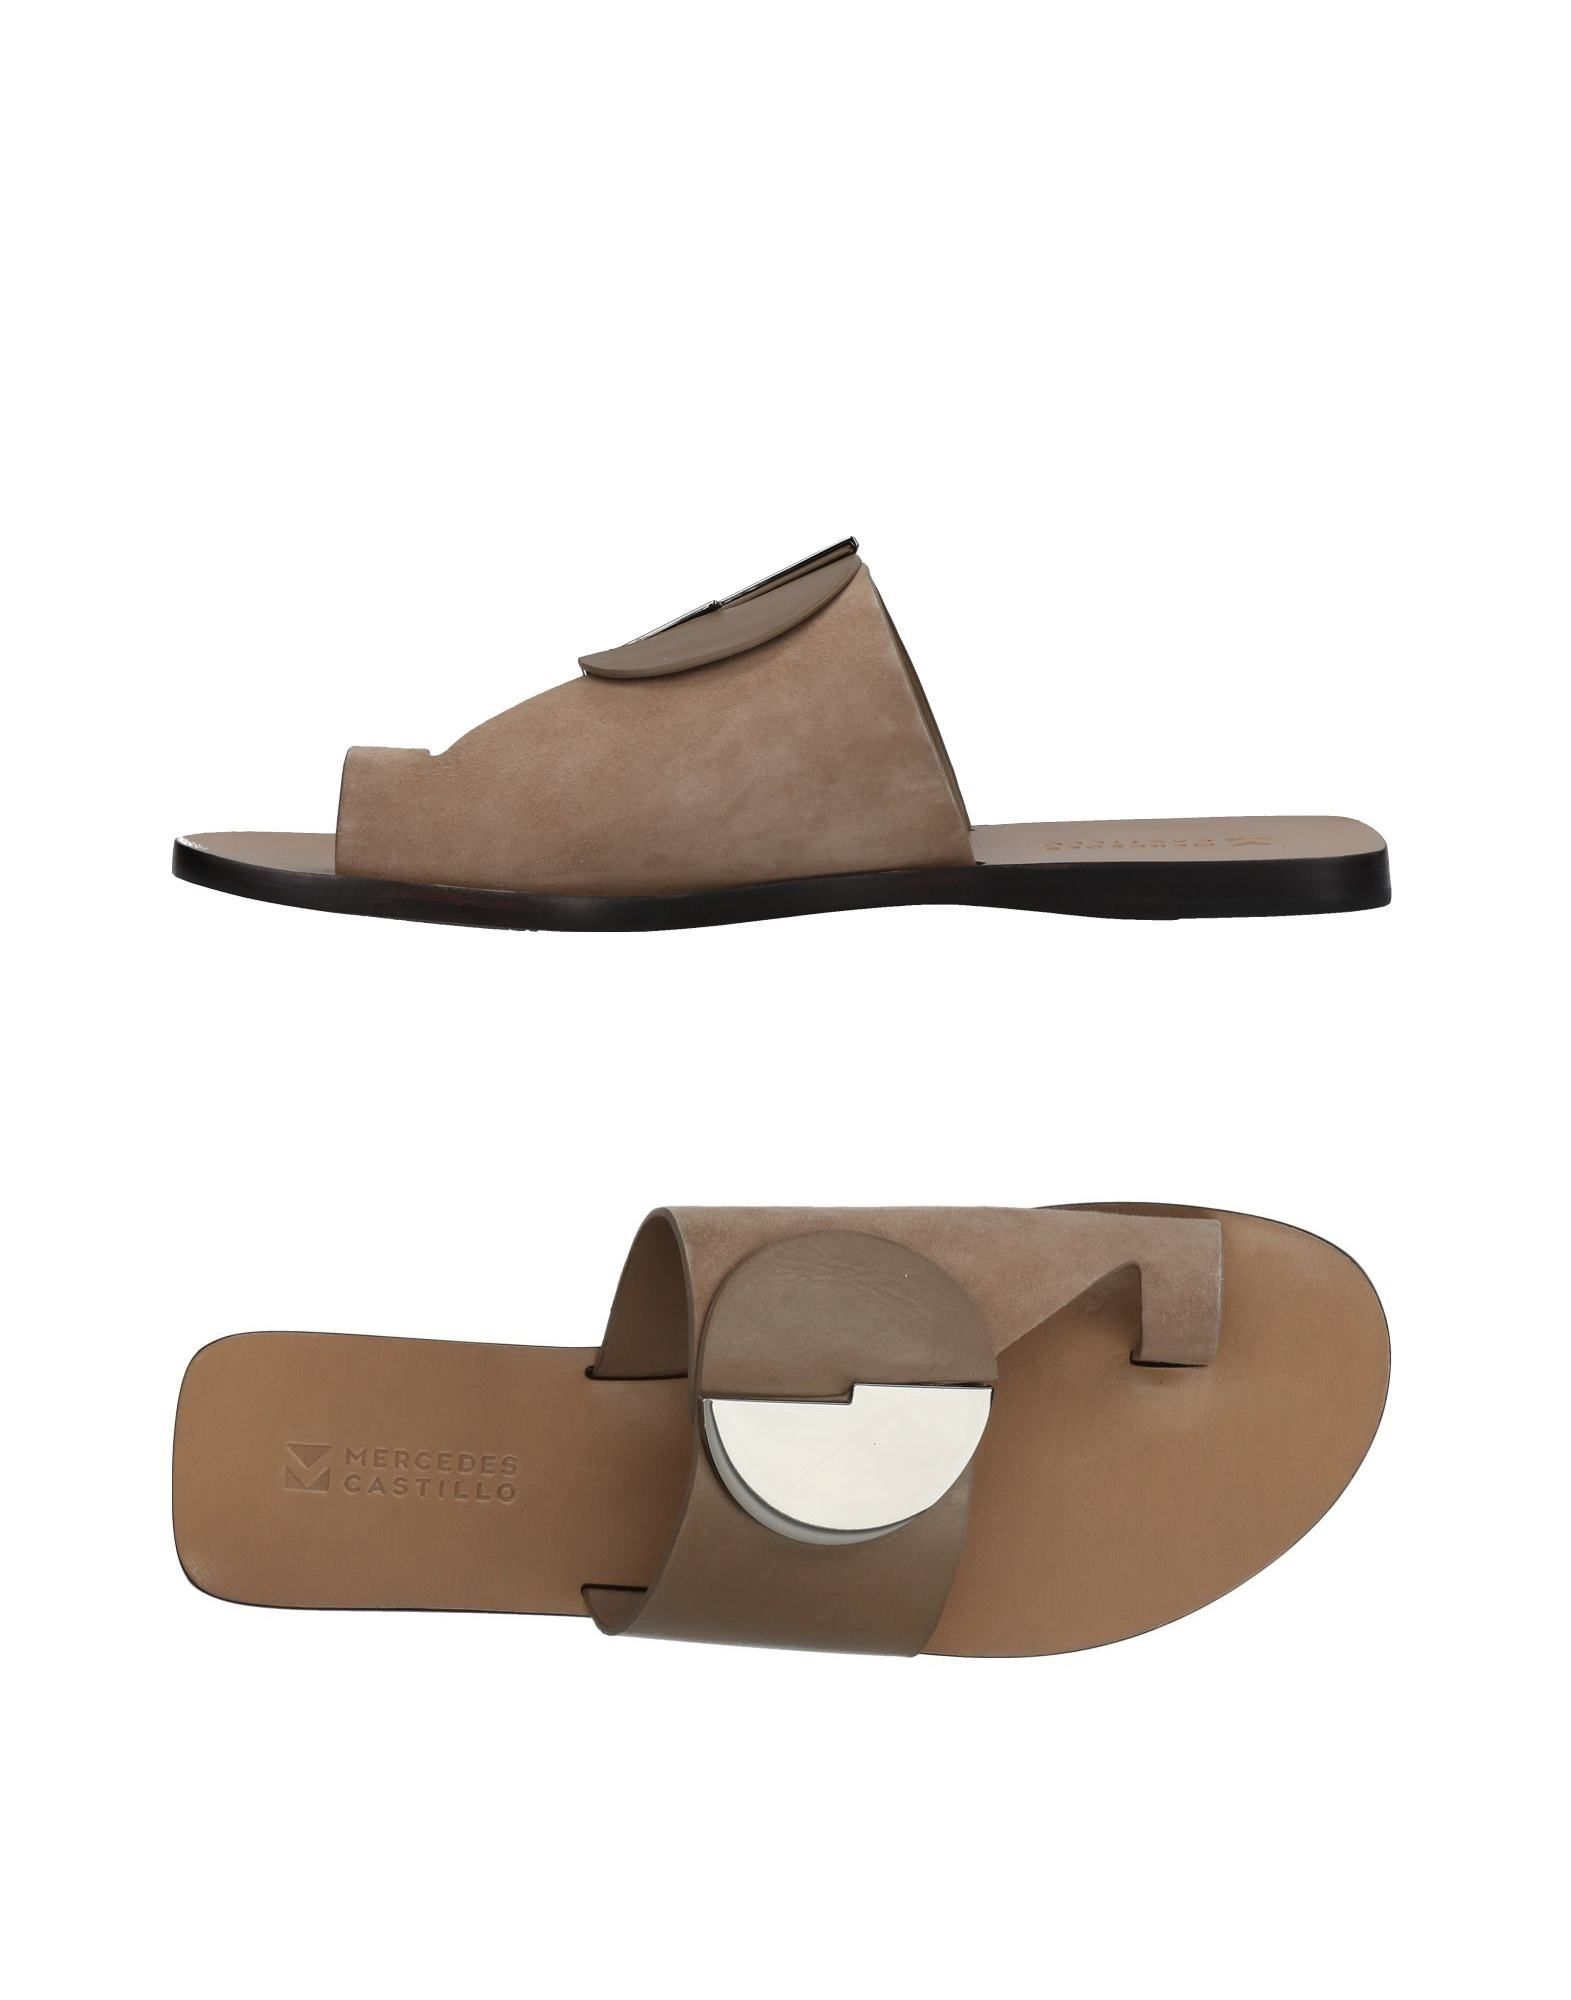 Stilvolle billige Schuhe  Mercedes Castillo Dianetten Damen  Schuhe 11449135LG 0165c2